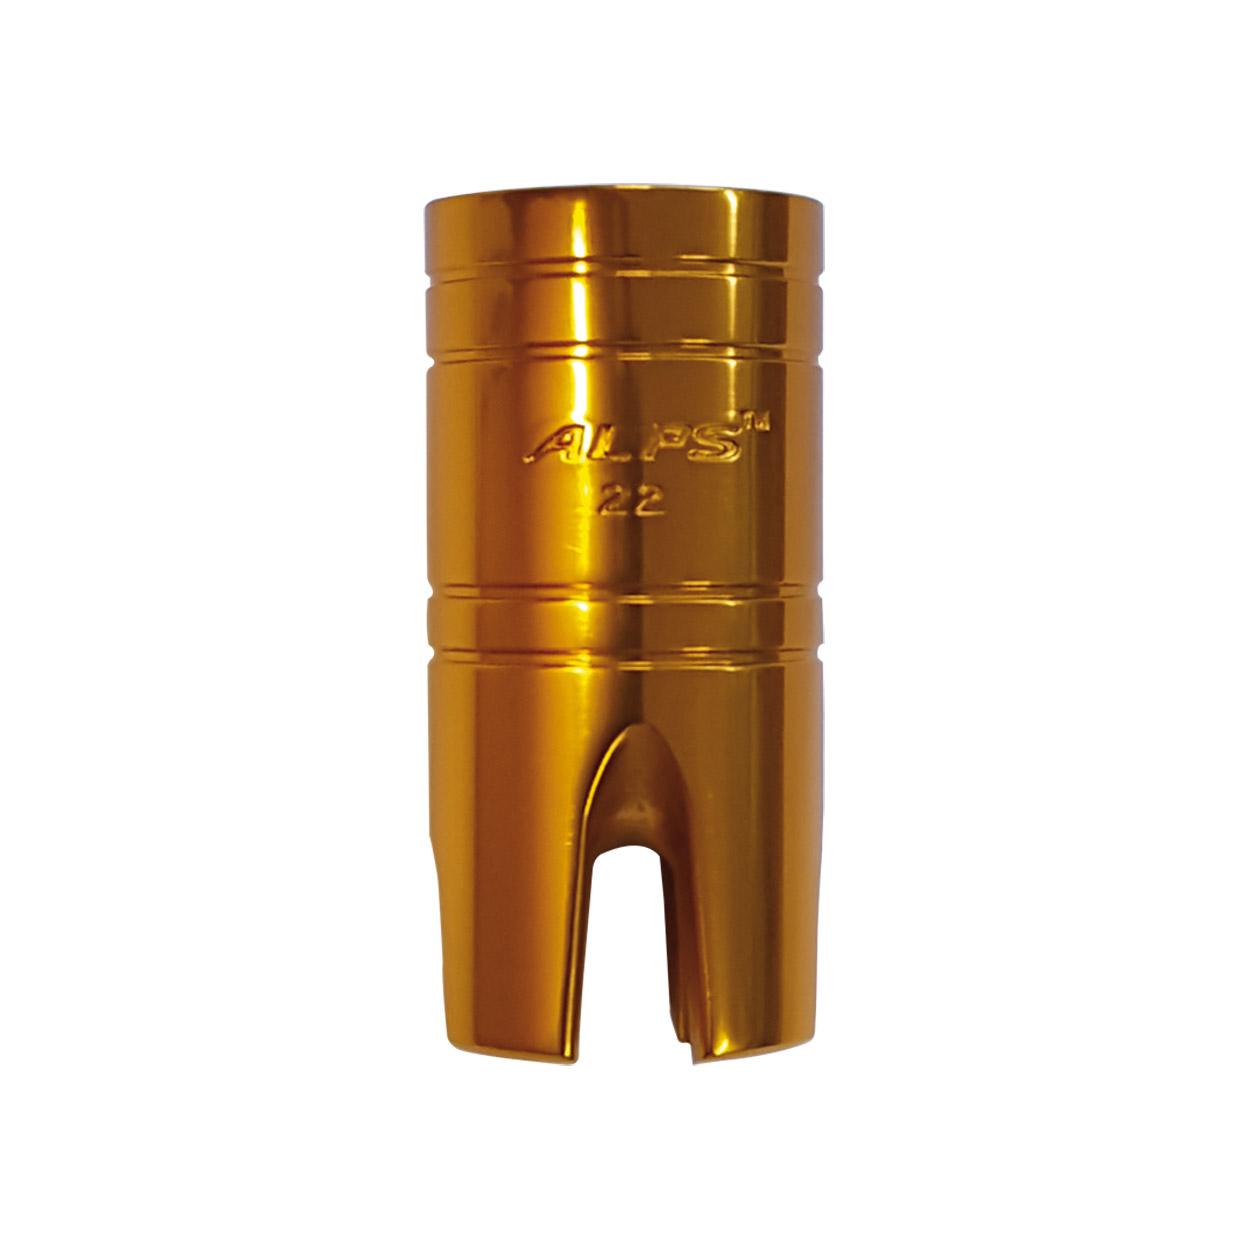 Crocera Alluminio Gimbals per Canna Gold